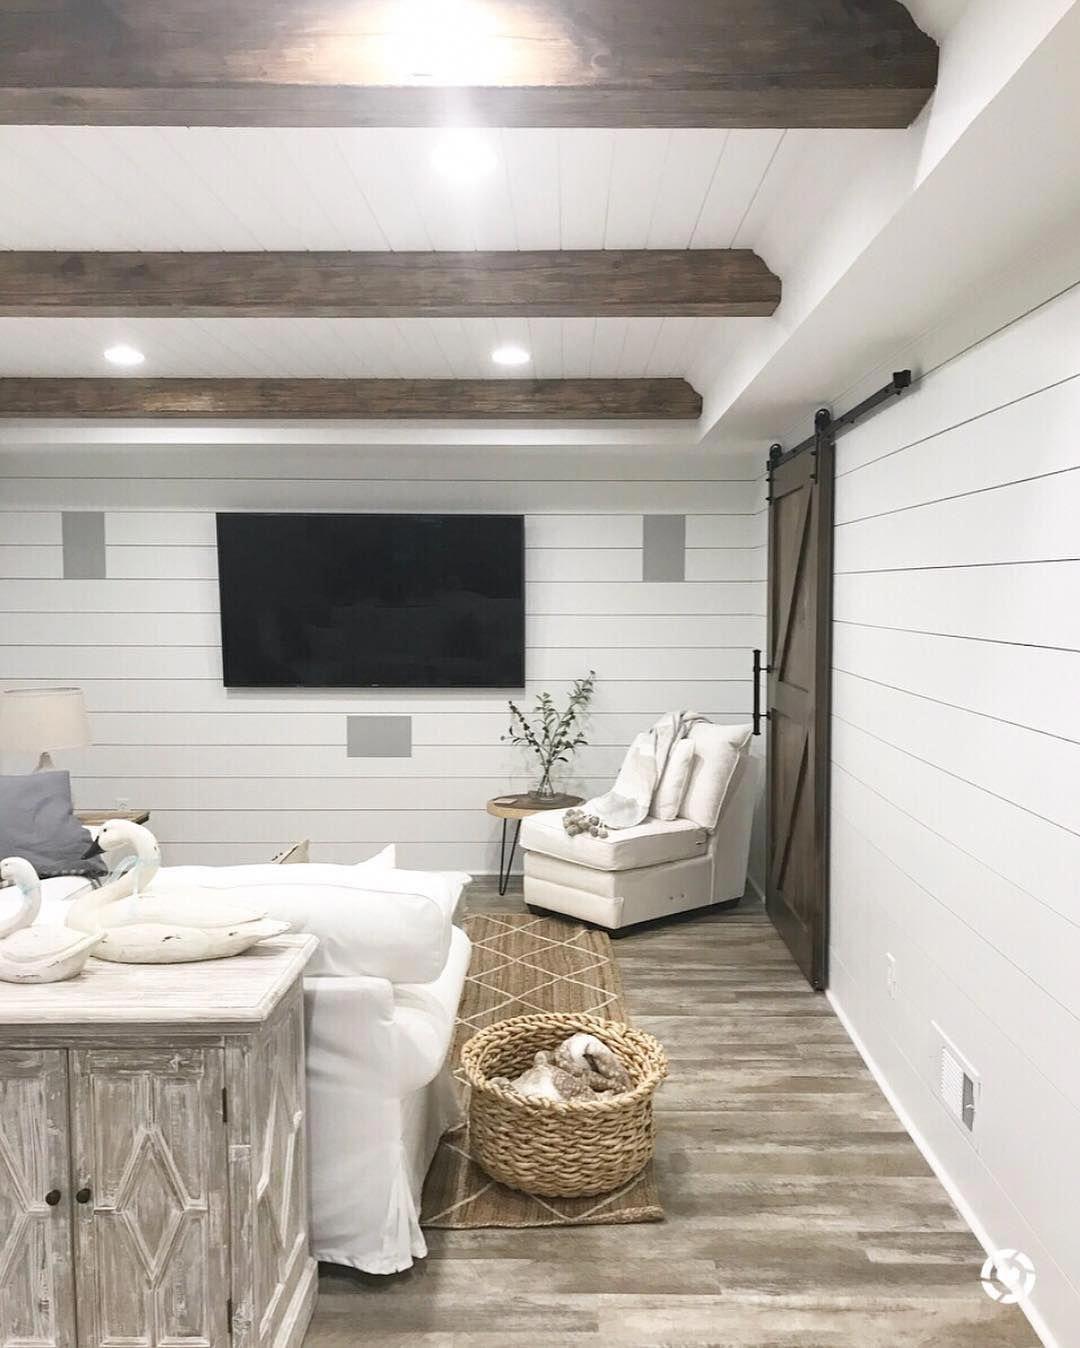 Basement Themes Decorating A Basement Family Room Ideas For Finishing Concrete Basement Walls 201 Basement Living Rooms Basement Design Basement Remodeling